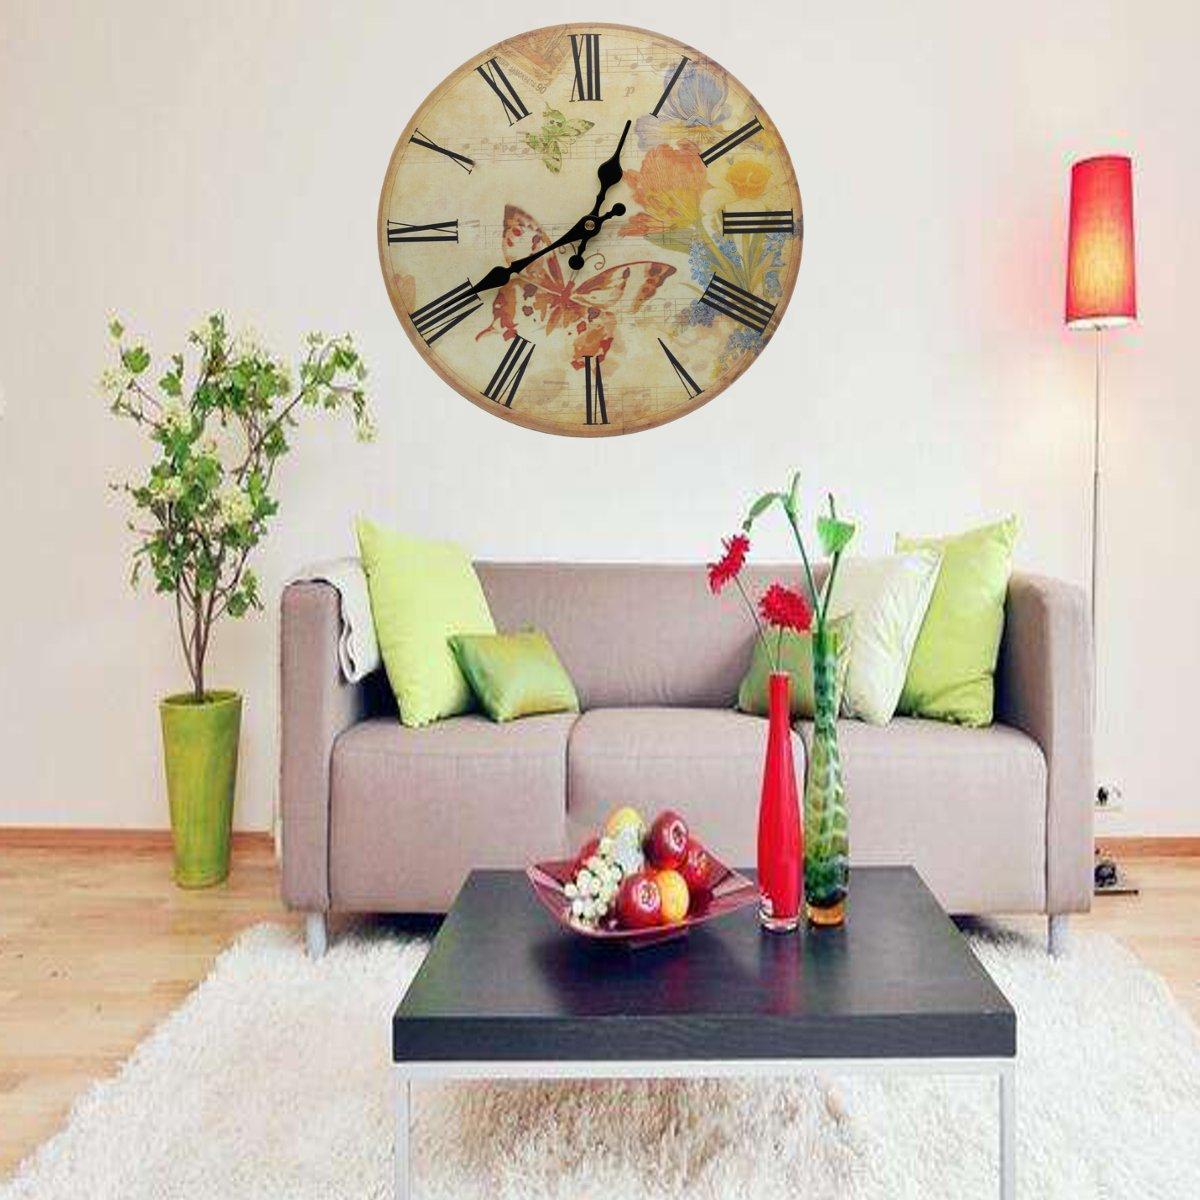 Kitchen Room Decor: 12'' Silent Vintage Rustic Wooden Round Wall Clock Retro